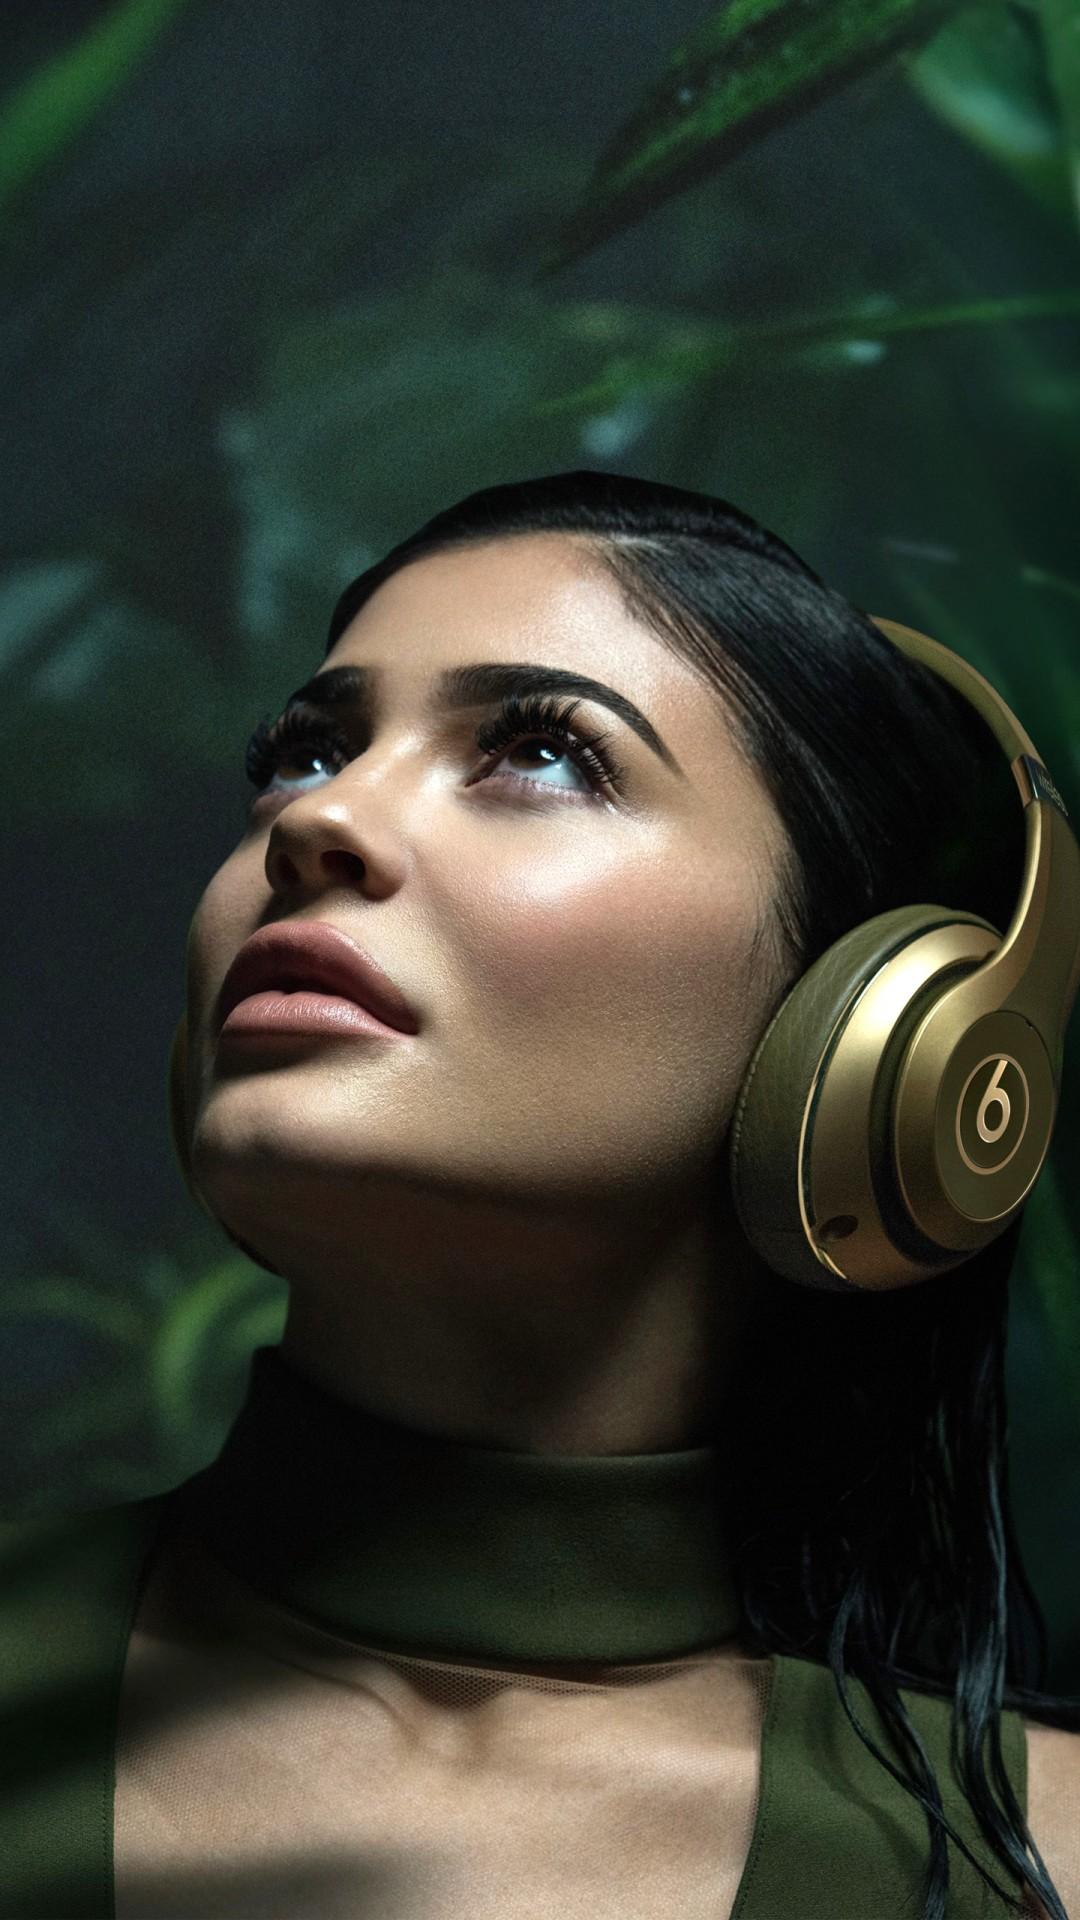 Iphone 6 Plus Retina Wallpaper Kylie Jenner Beats 4k Wallpapers Hd Wallpapers Id 20972